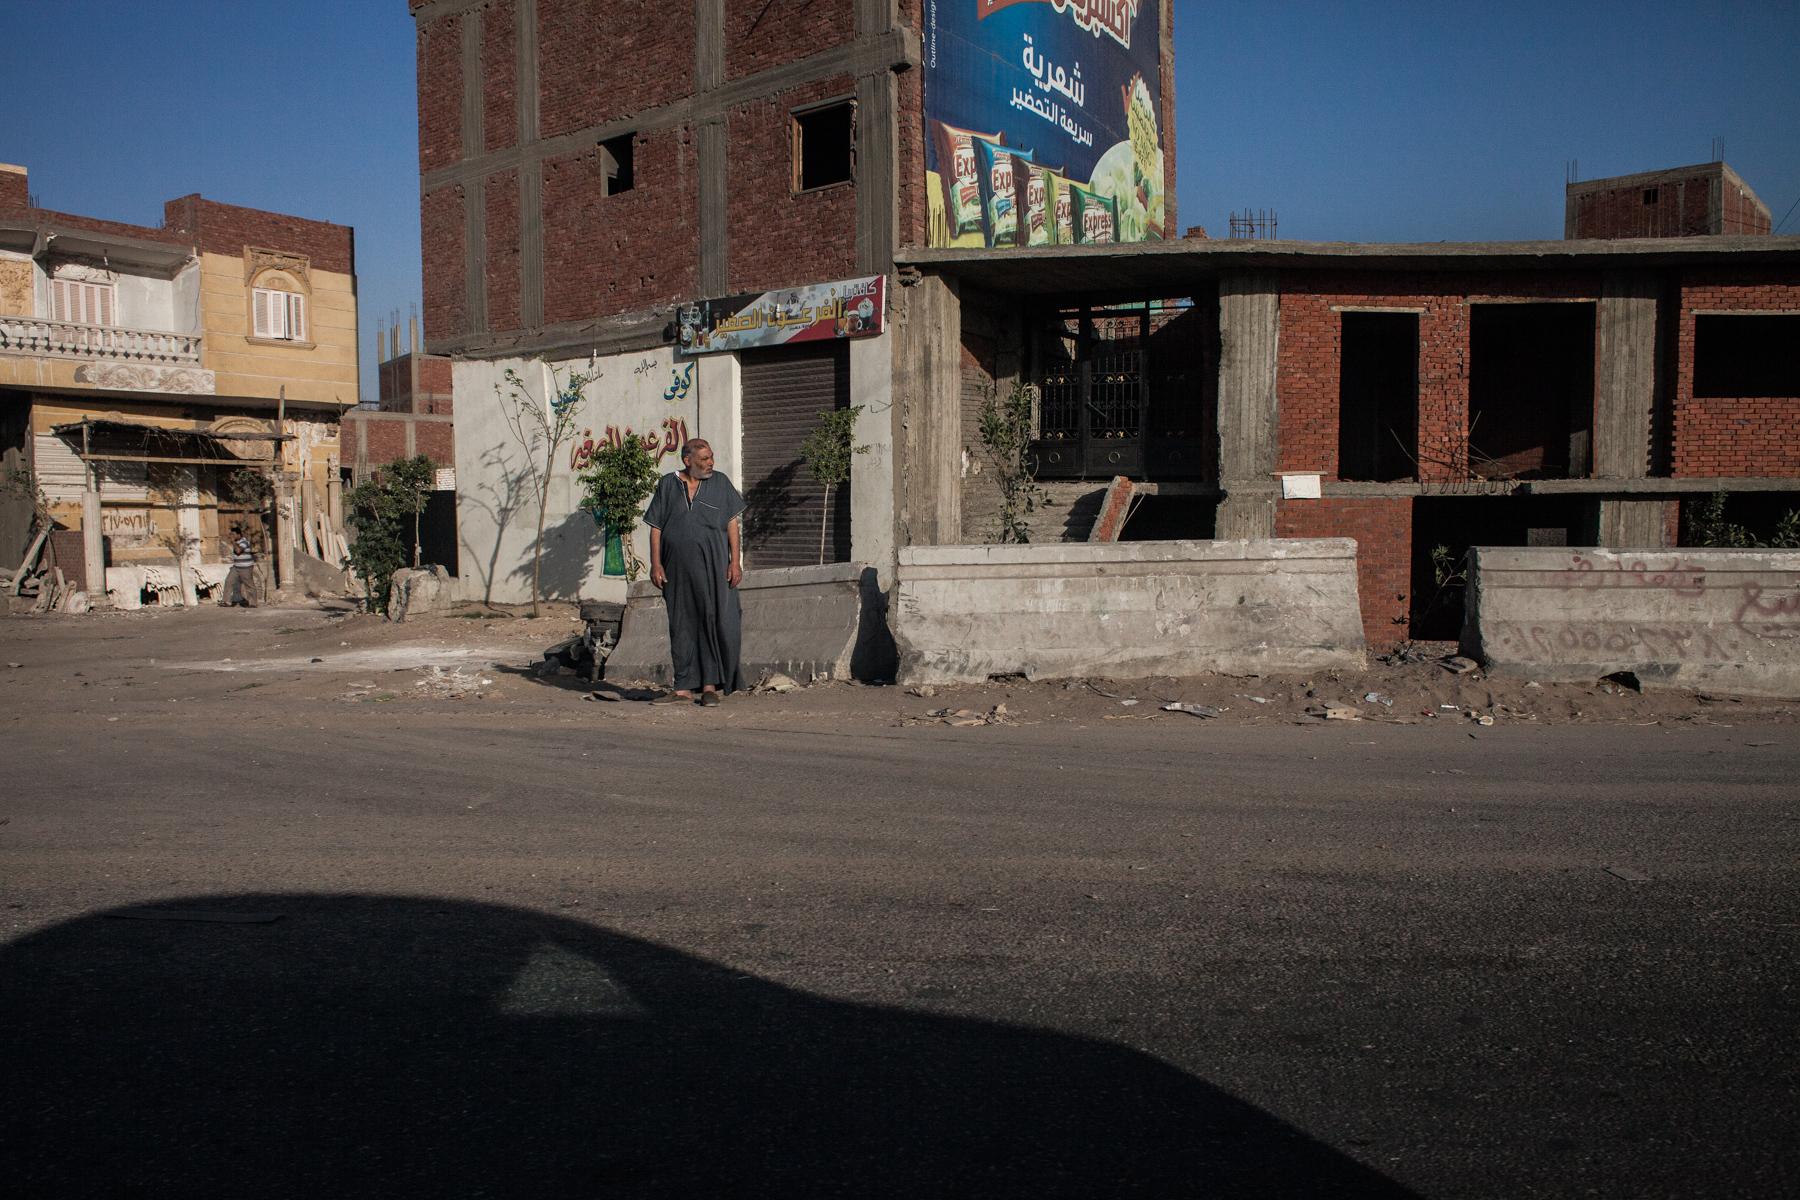 Samara/Egypt